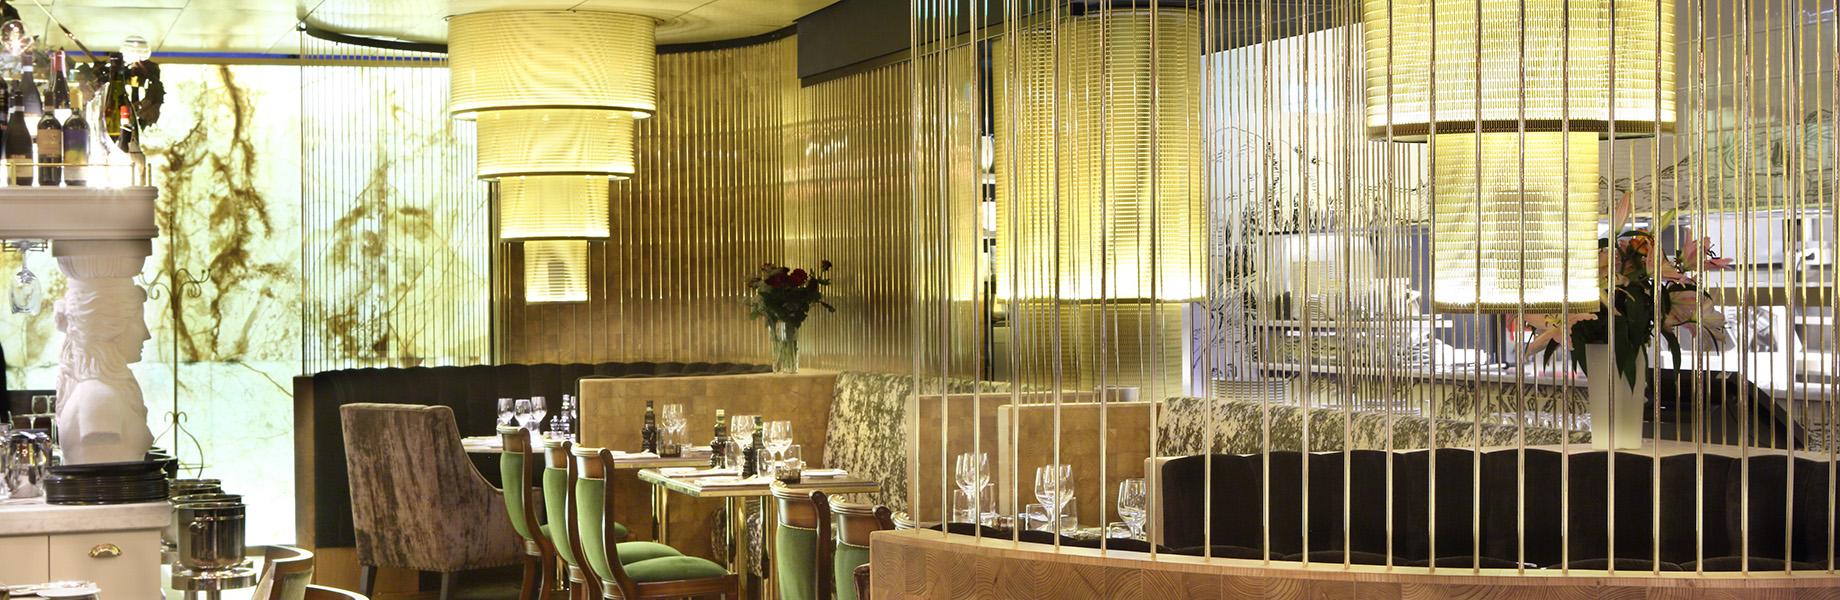 Marble Restaurant Design Aaltos Italian Grill Garden Lithos Design